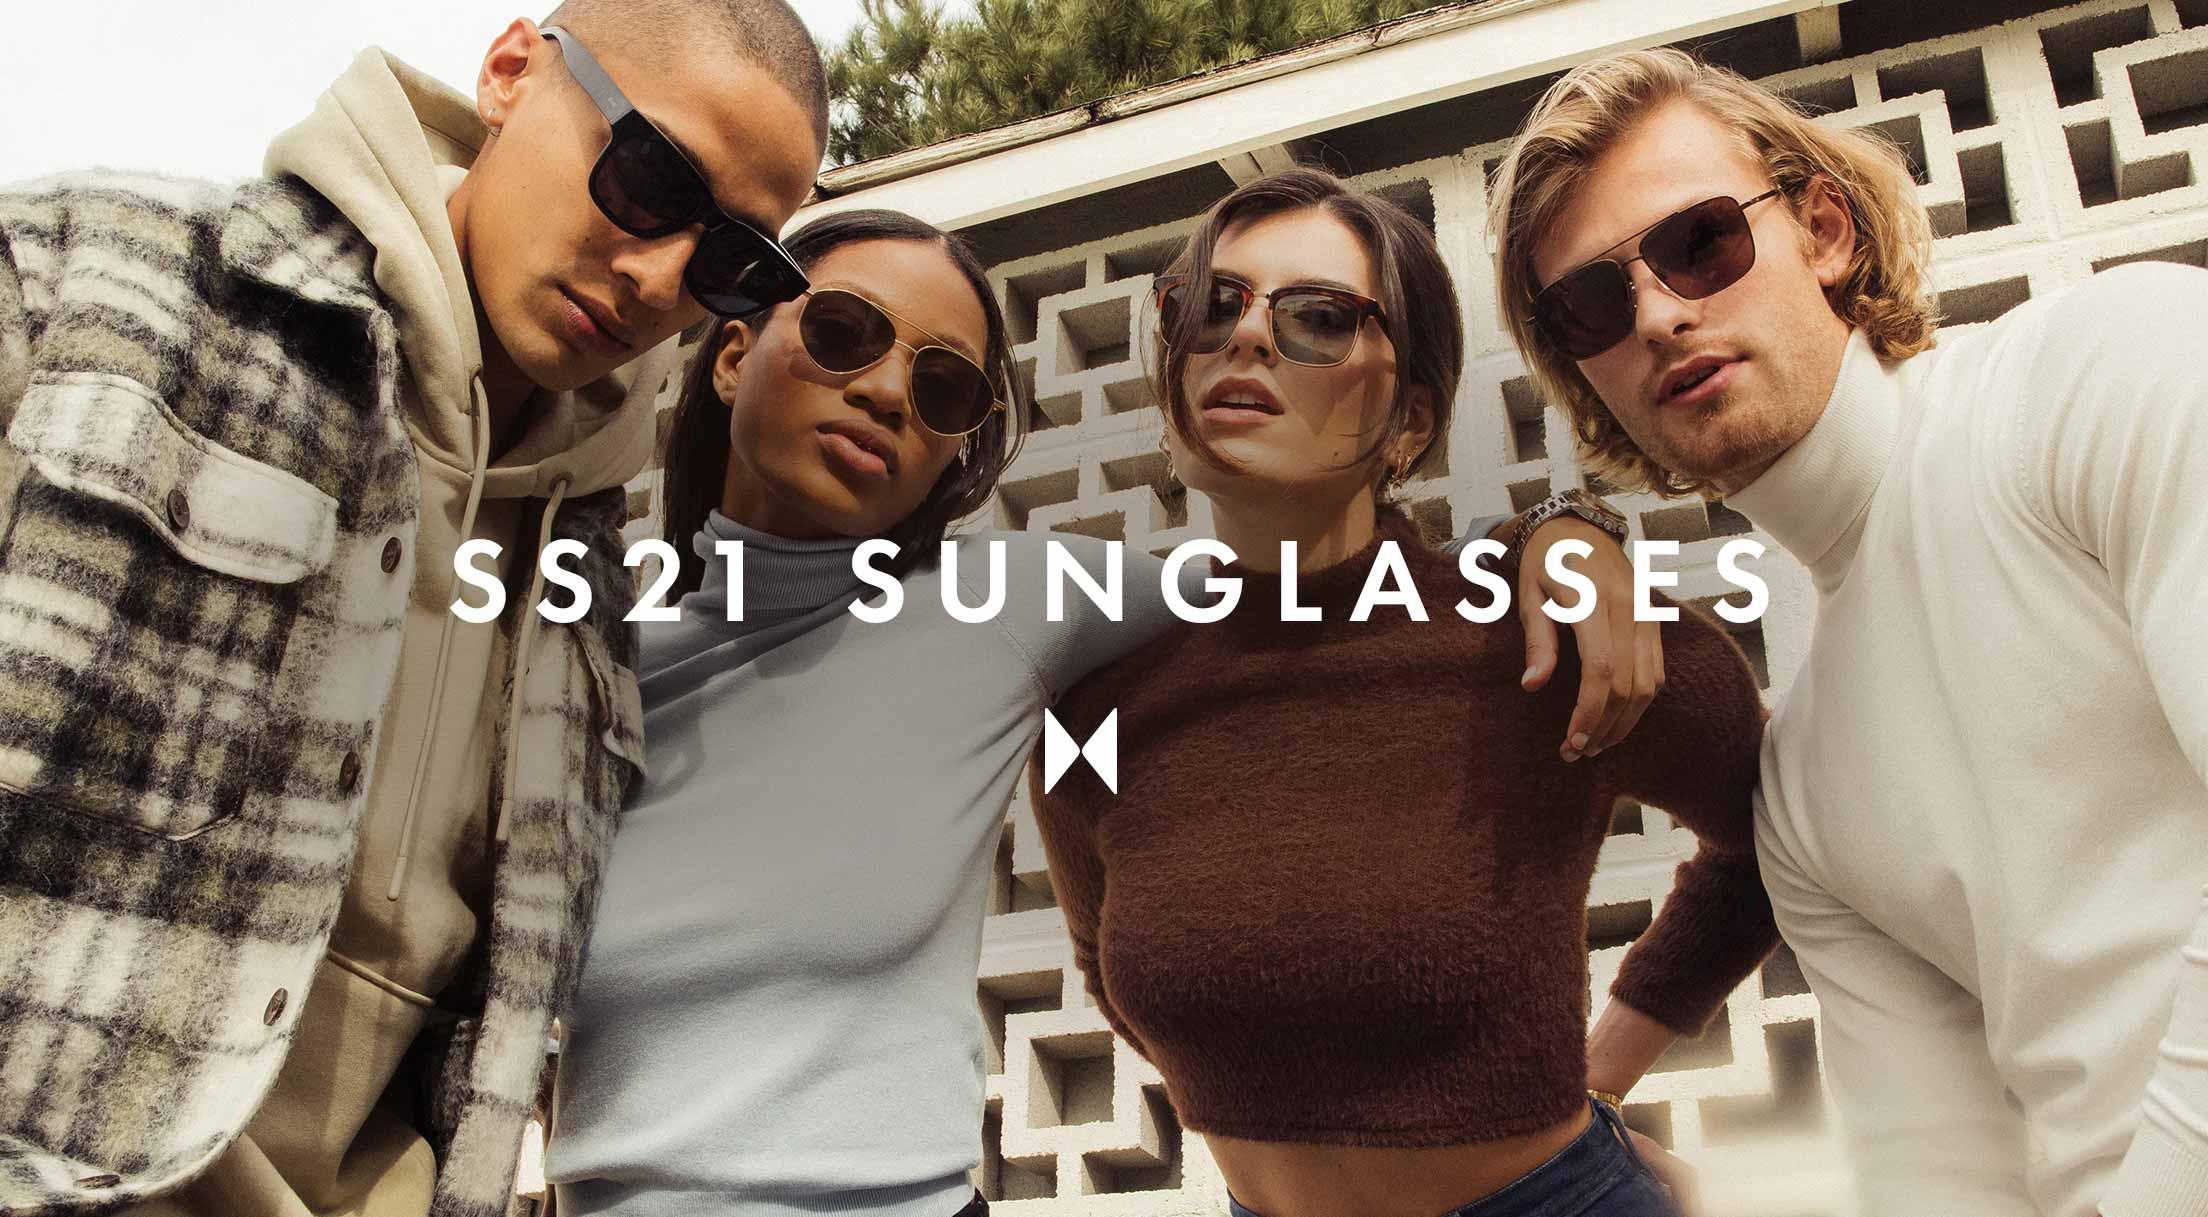 SS21 Sunglasses